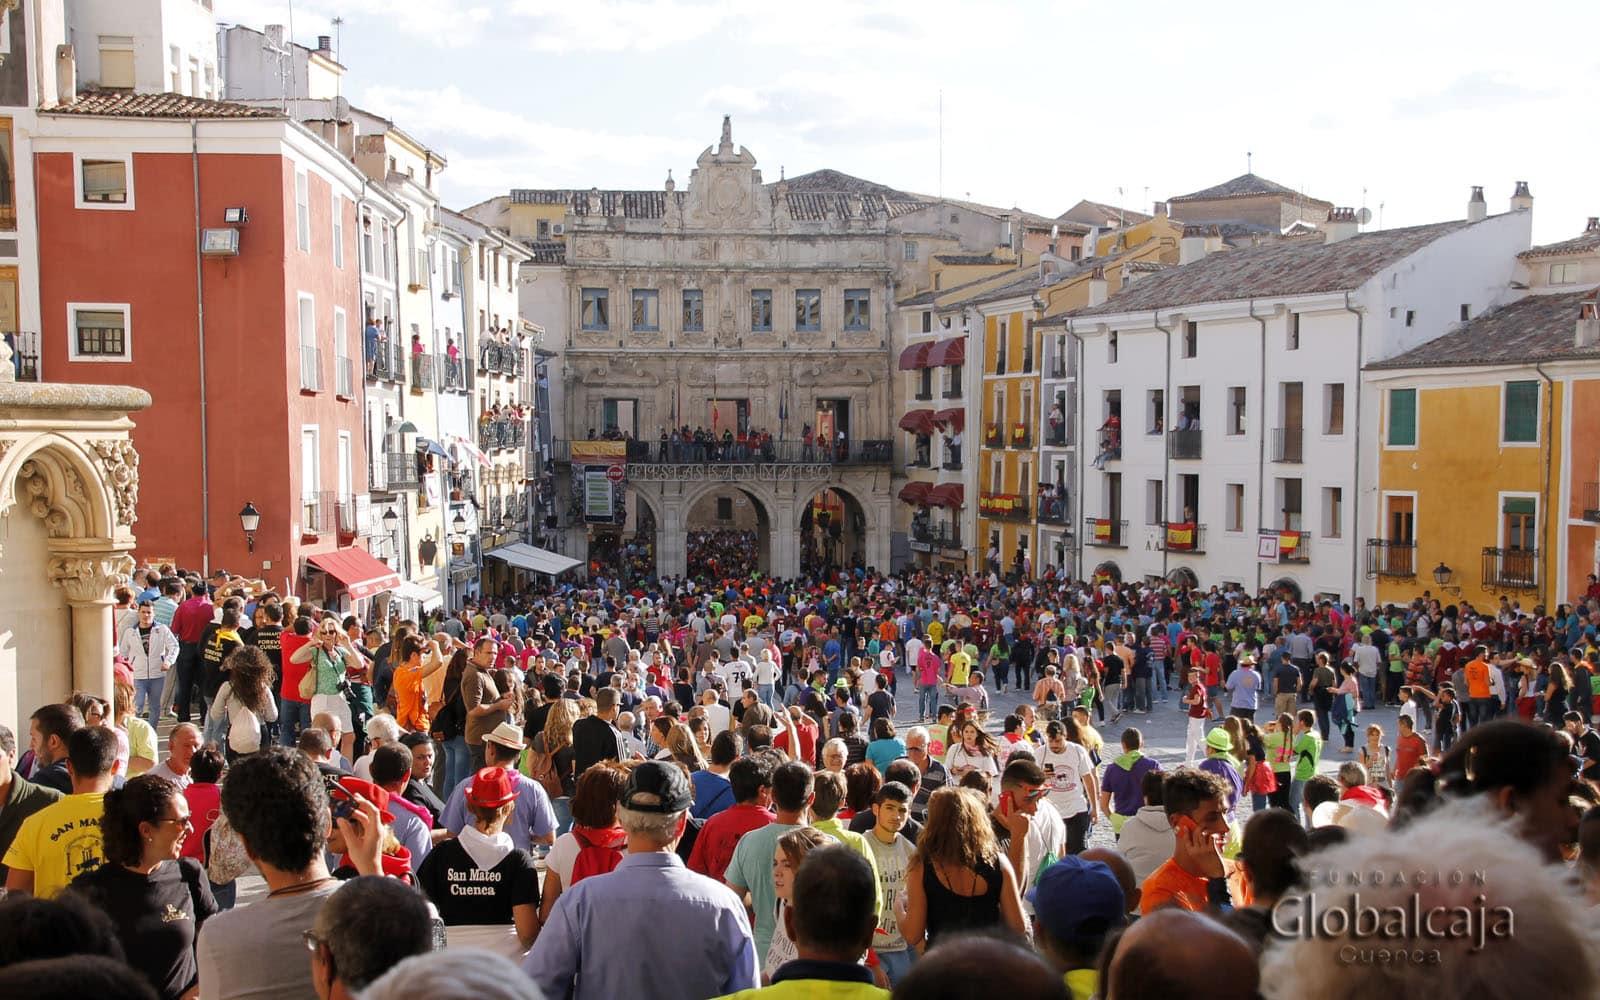 https://blog.globalcaja.es/wp-content/uploads/2017/09/Fiestas-san-mateo.jpg